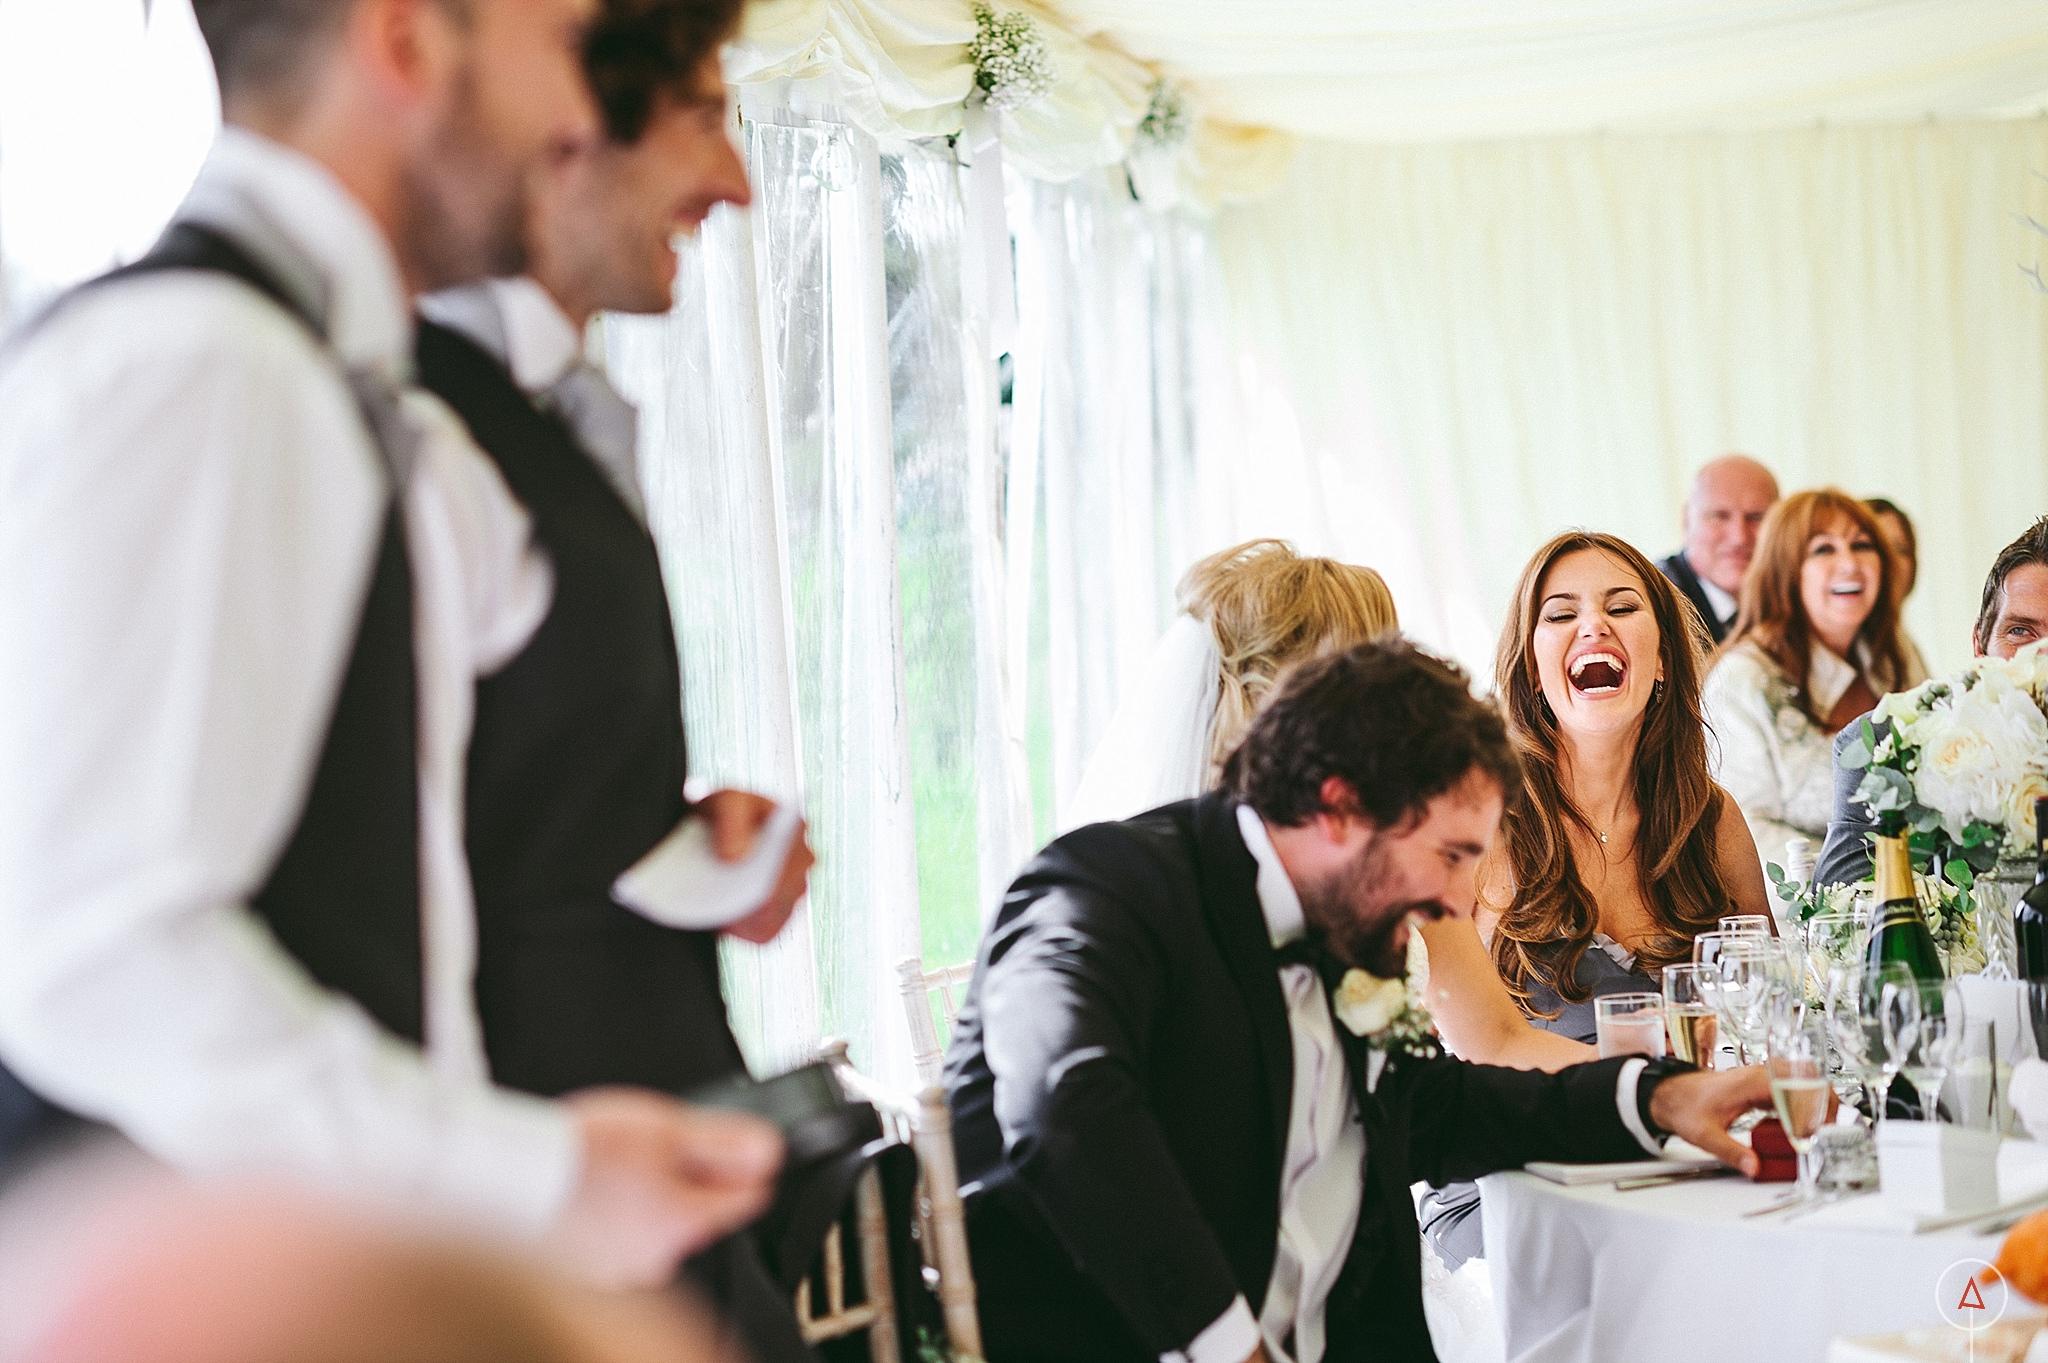 cardiff-wedding-photographer-aga-tomaszek_0397